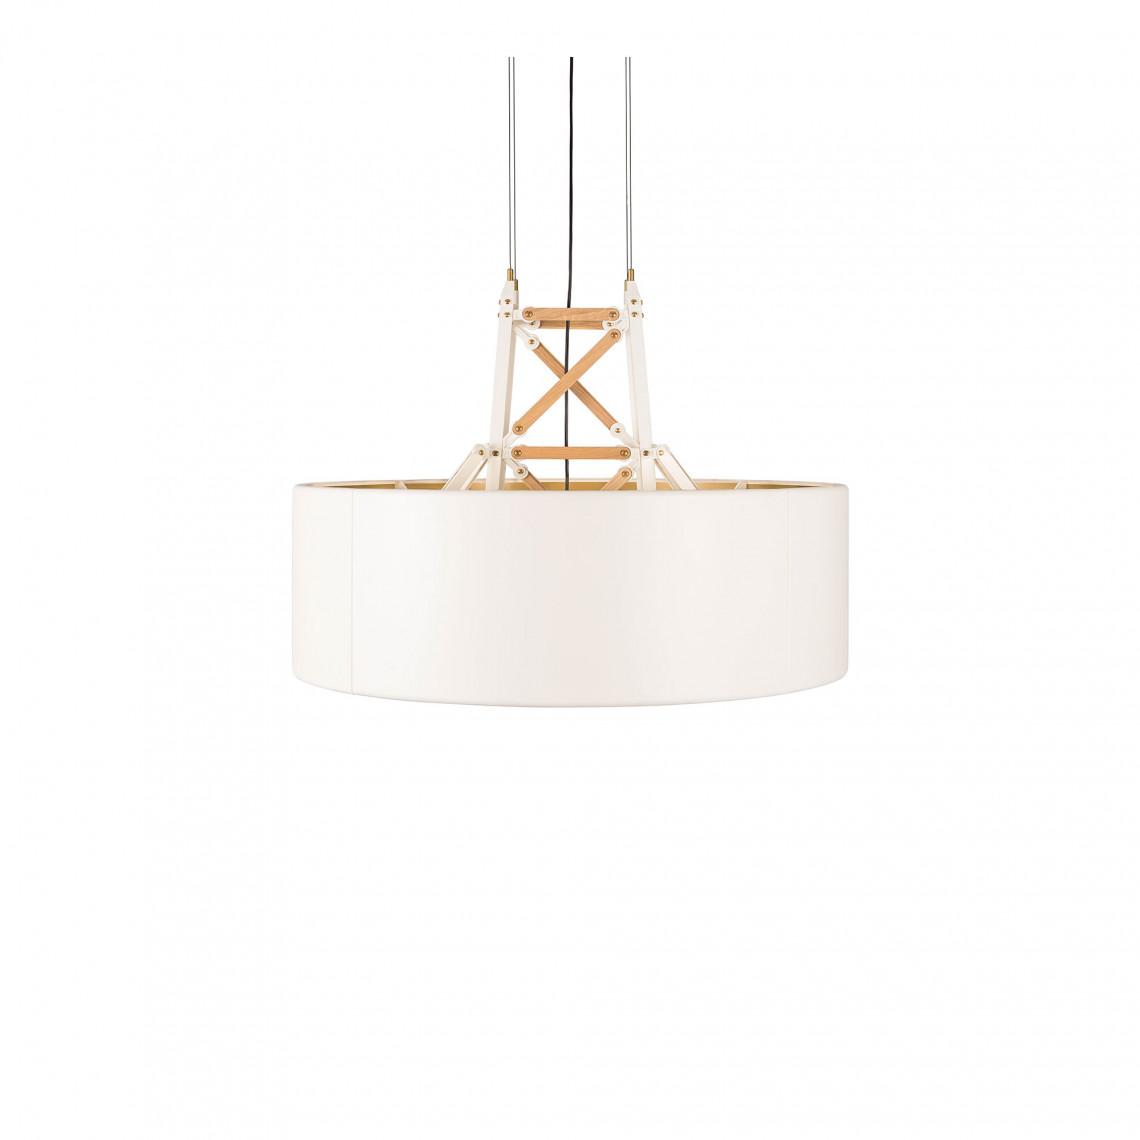 Construction Lamp - Pendellampa Vit